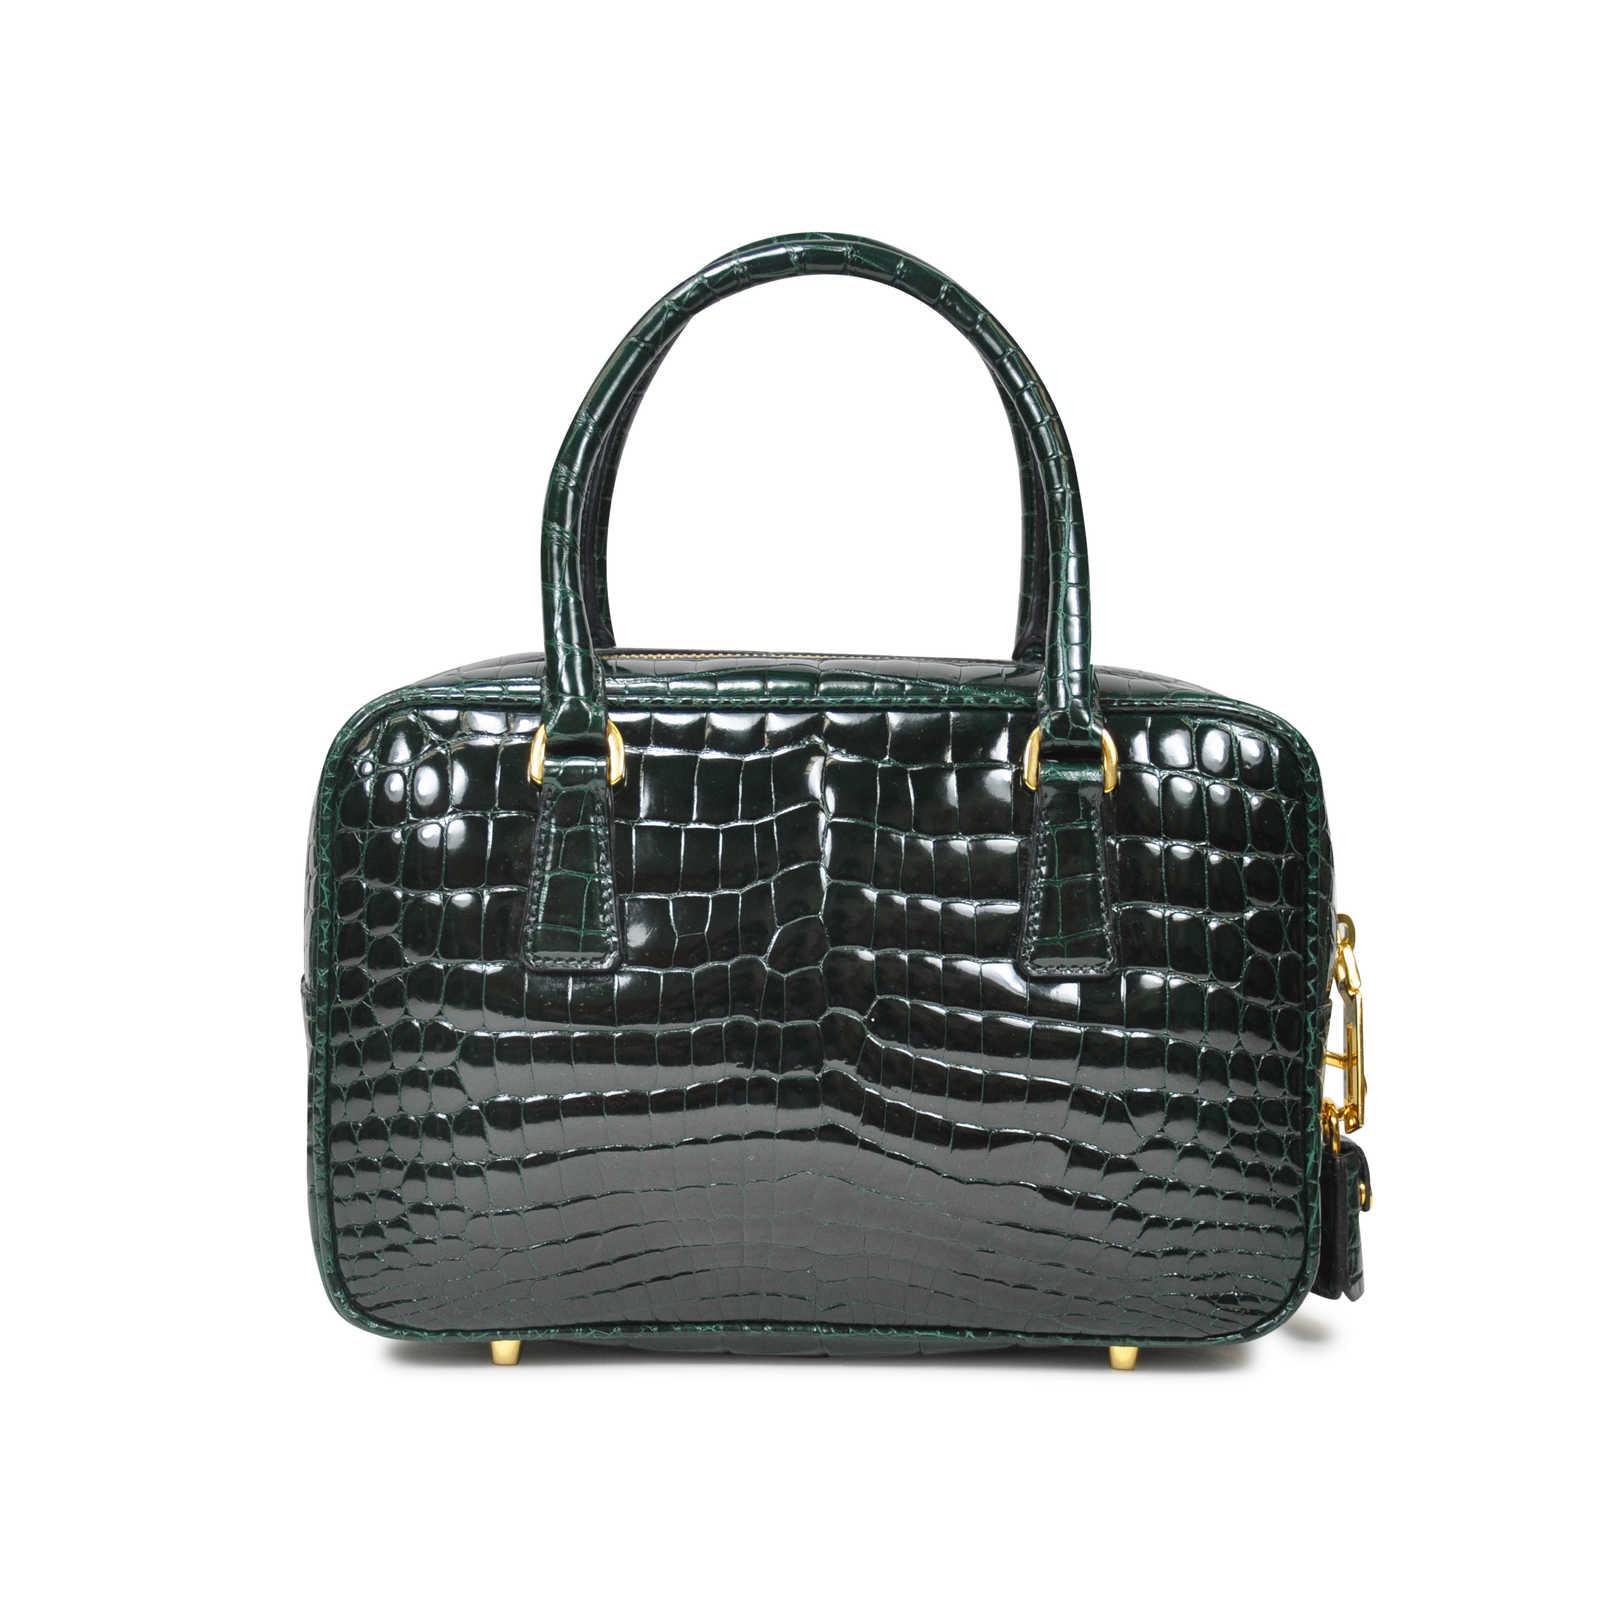 Authentic Pre Owned Prada Crocodile Handbag Pss 020 00020 Thumbnail 1